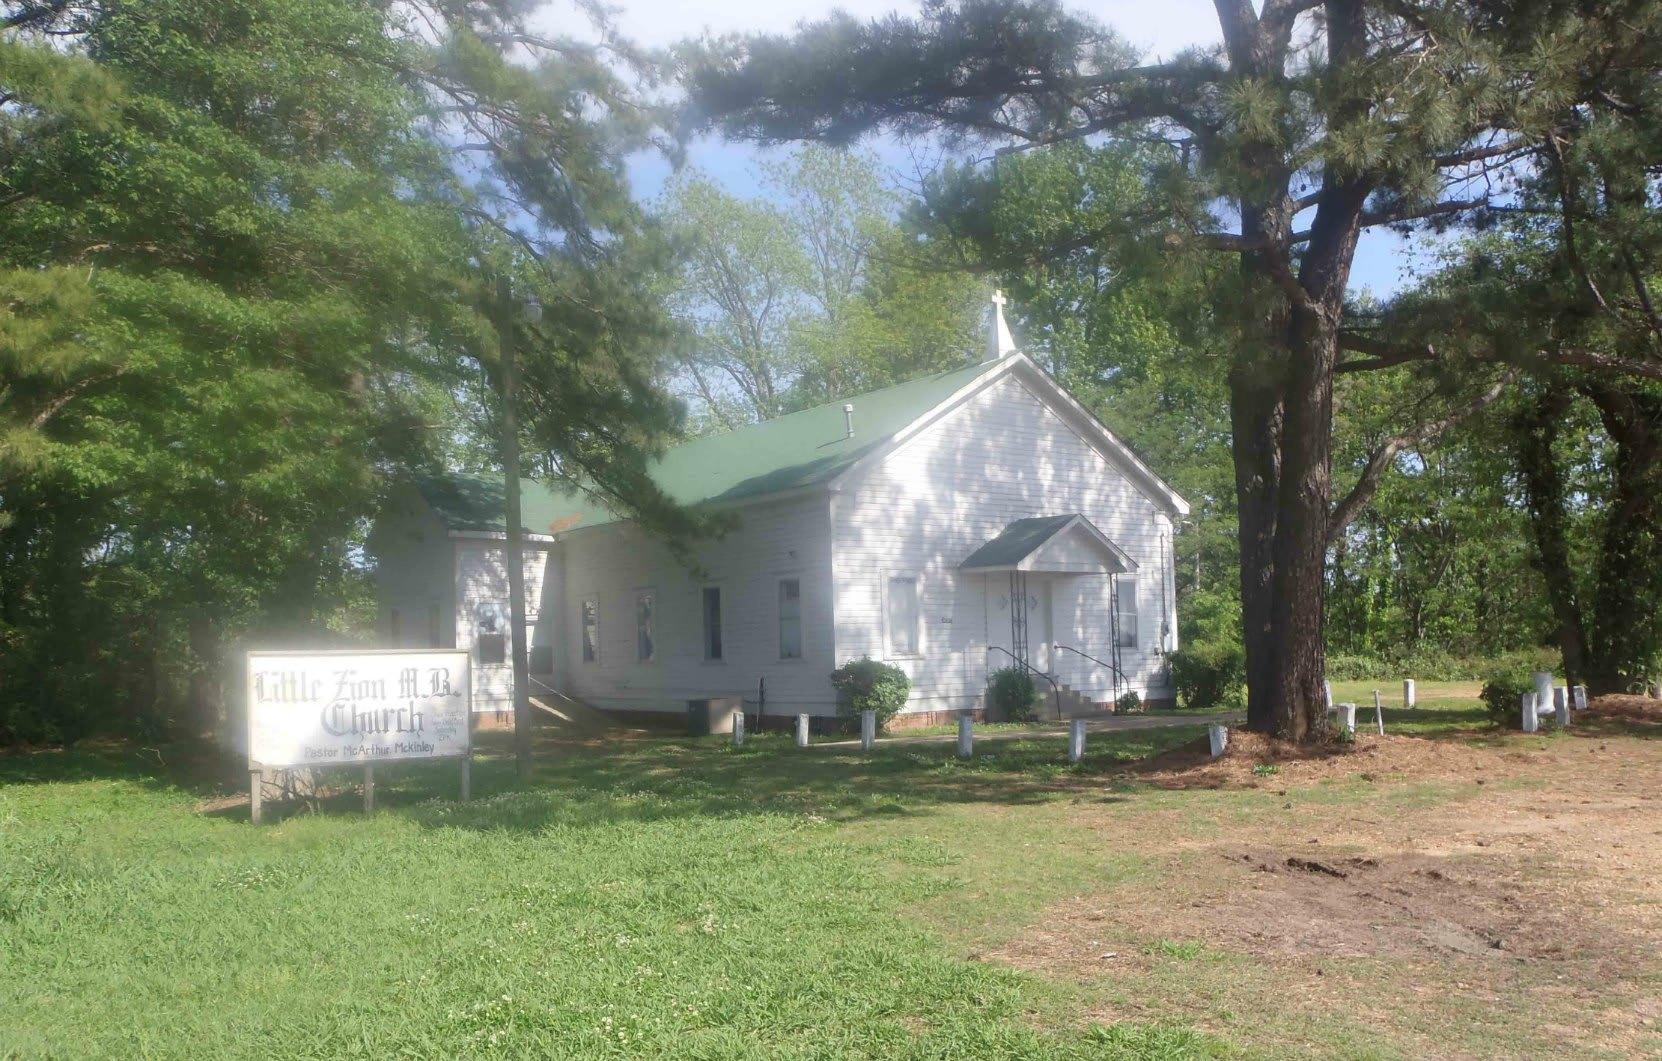 Little Zion Baptist Church in Greenwood, Mississippi